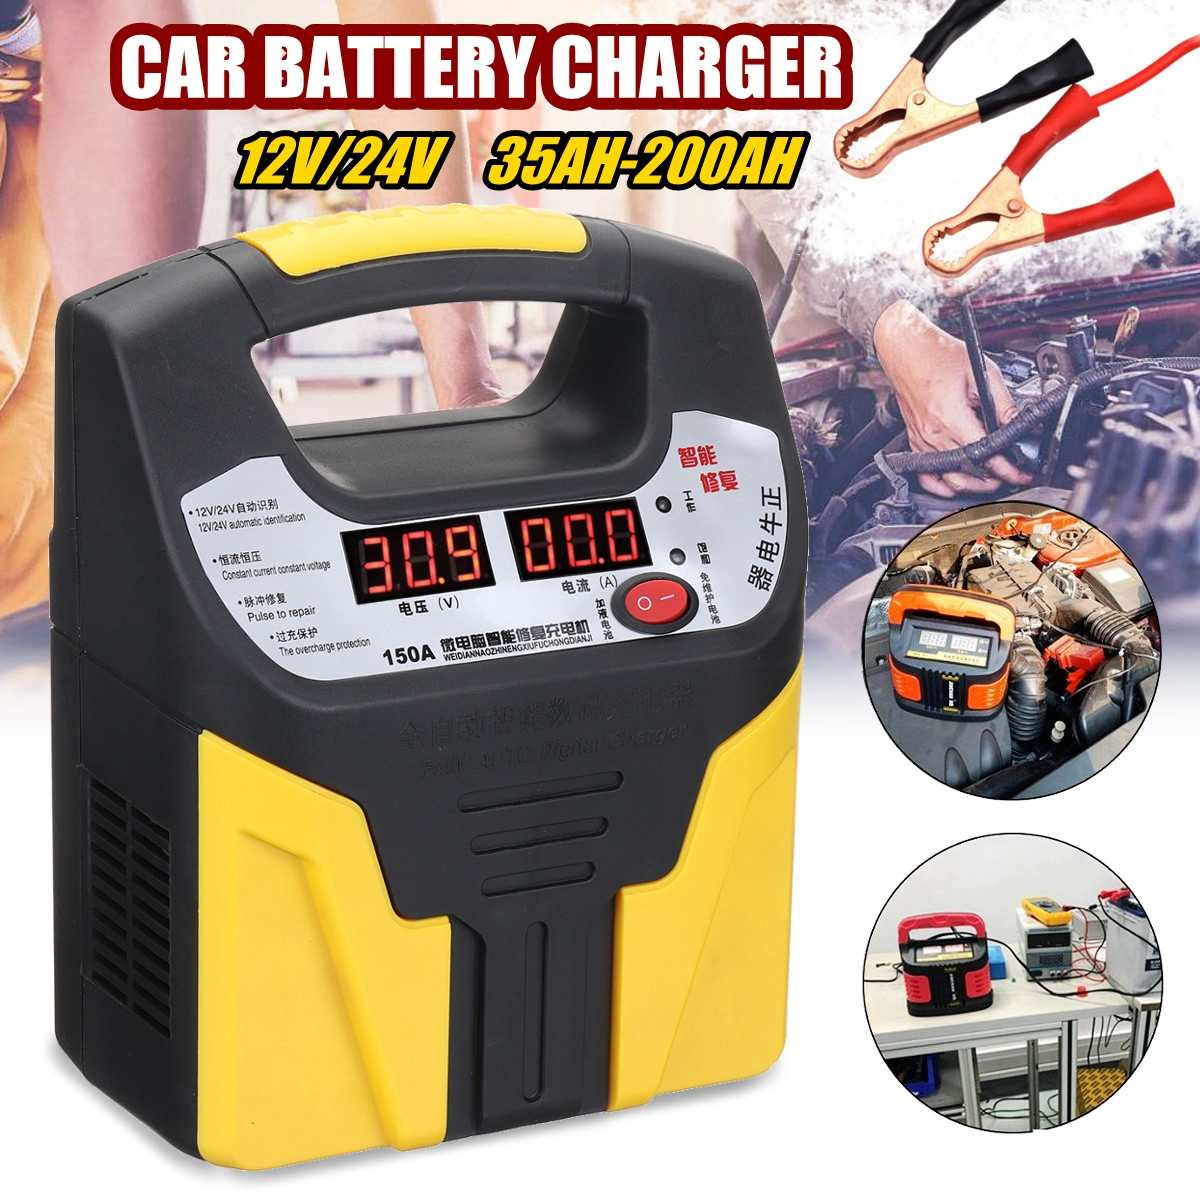 Automatische 12 V/24 V Auto Lagerung Batterie Ladegerät LCD Intelligente Puls 110/220V Reparatur für Blei säure Lithium Batterie 35AH-200AH